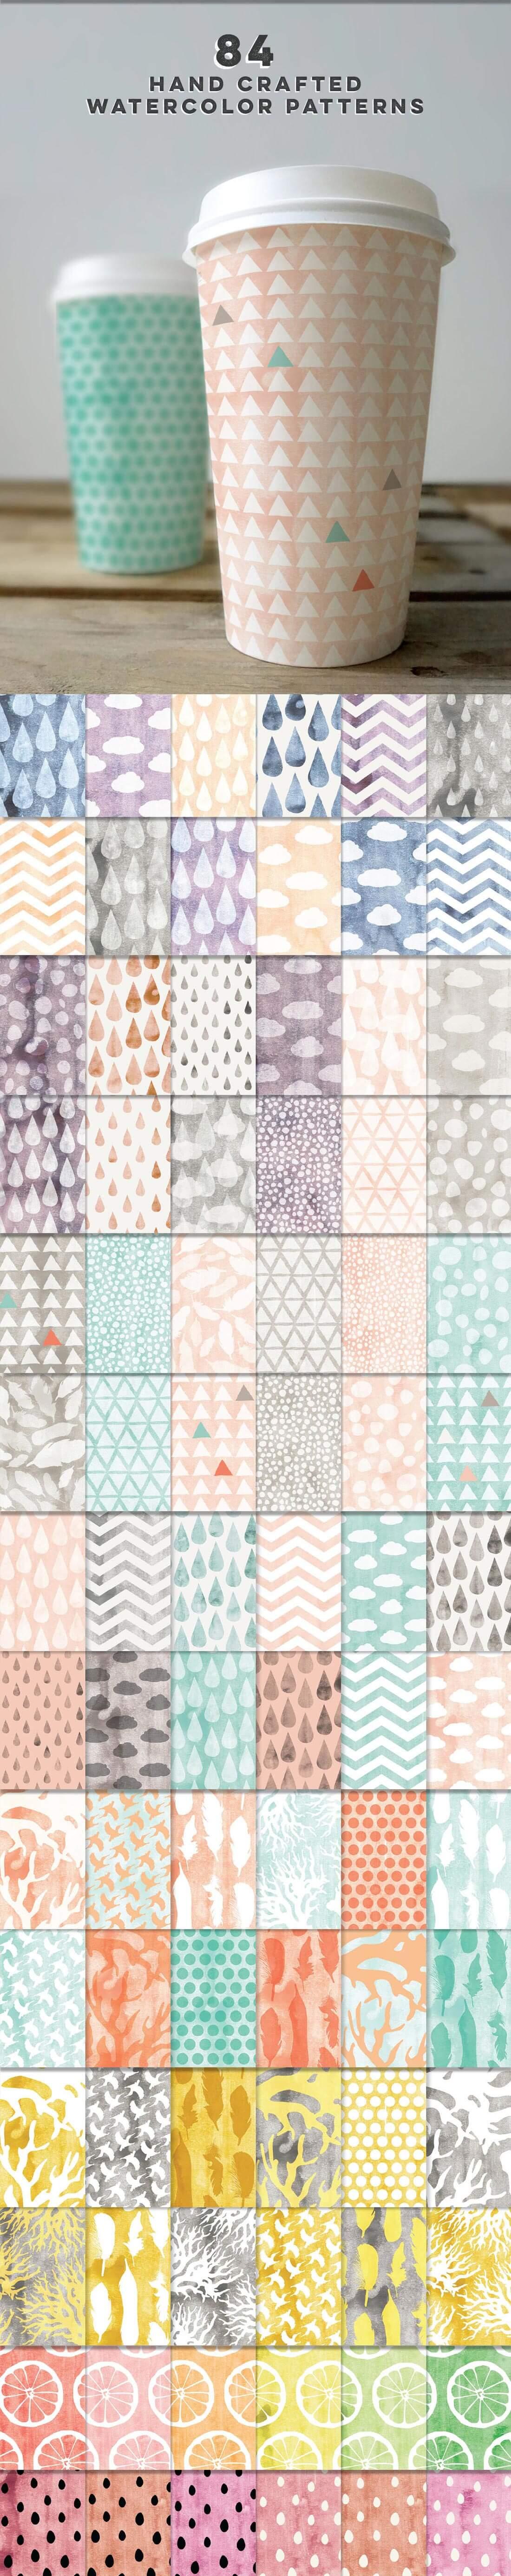 540 Geometric Patterns Super Bundle from Blixa 6 Studios - Blixa6Studios 3